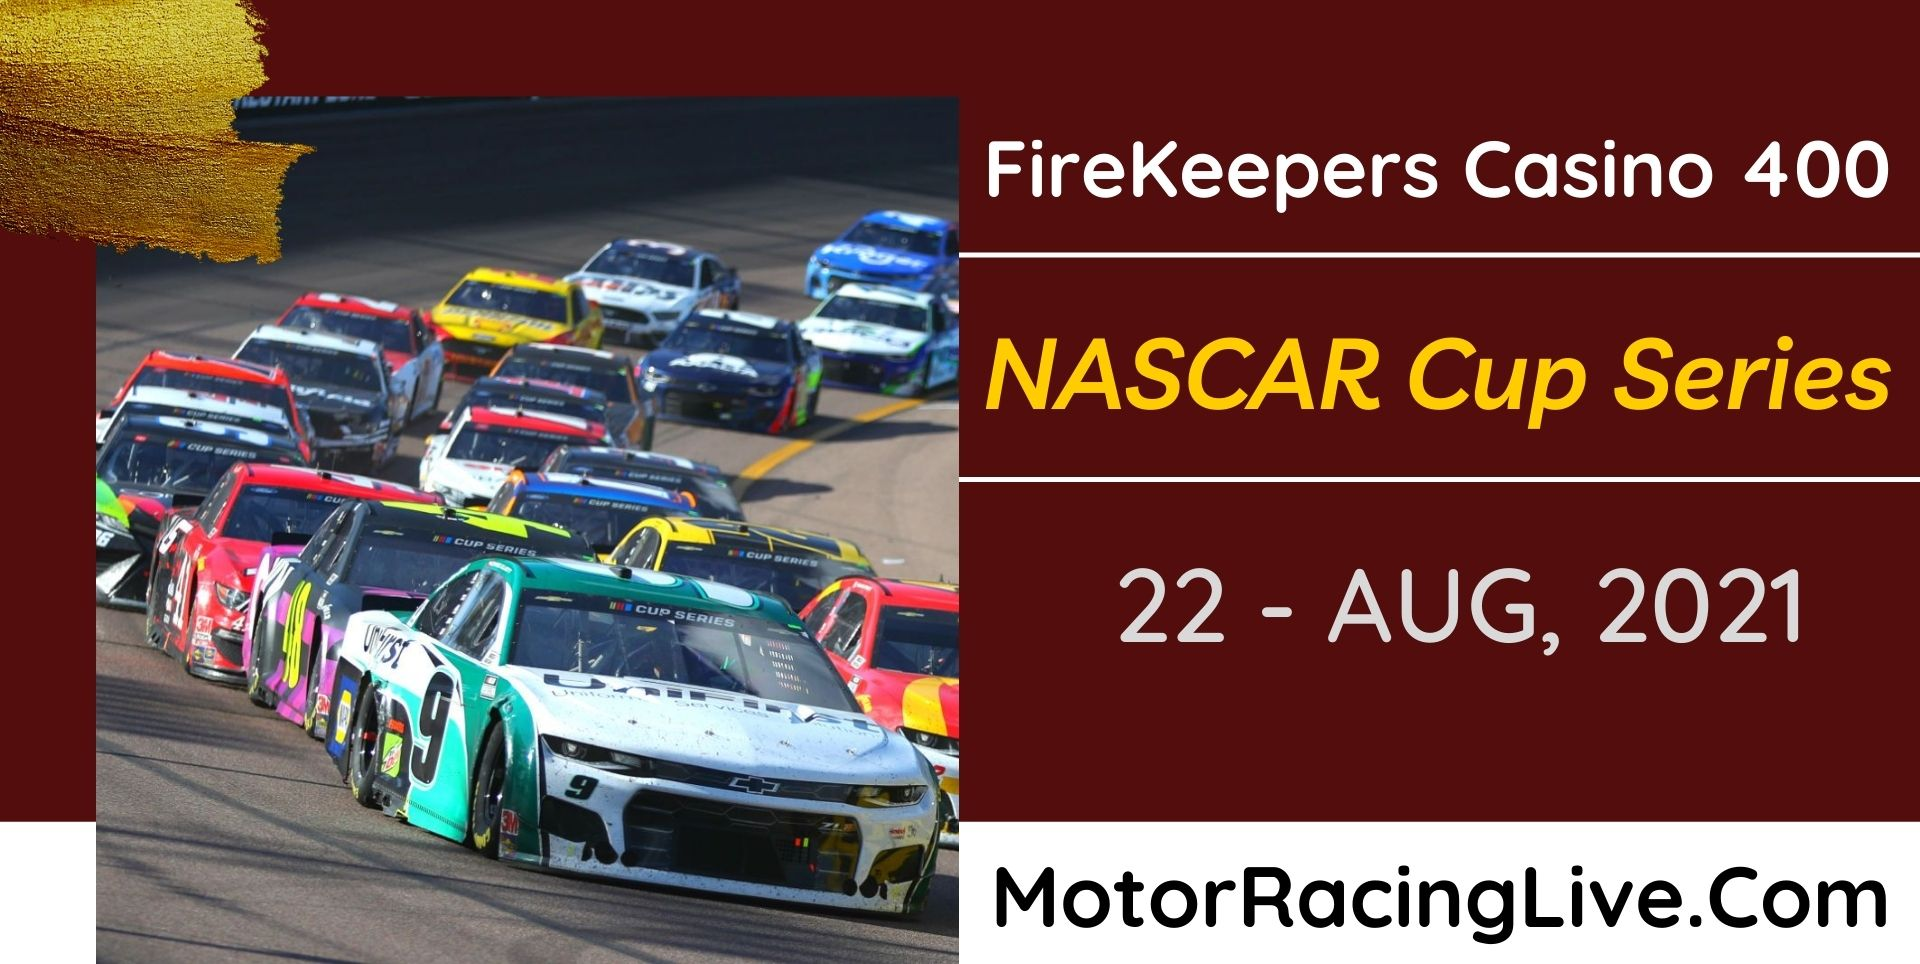 FireKeepers Casino 400 Live Stream 2021: NASCAR Cup